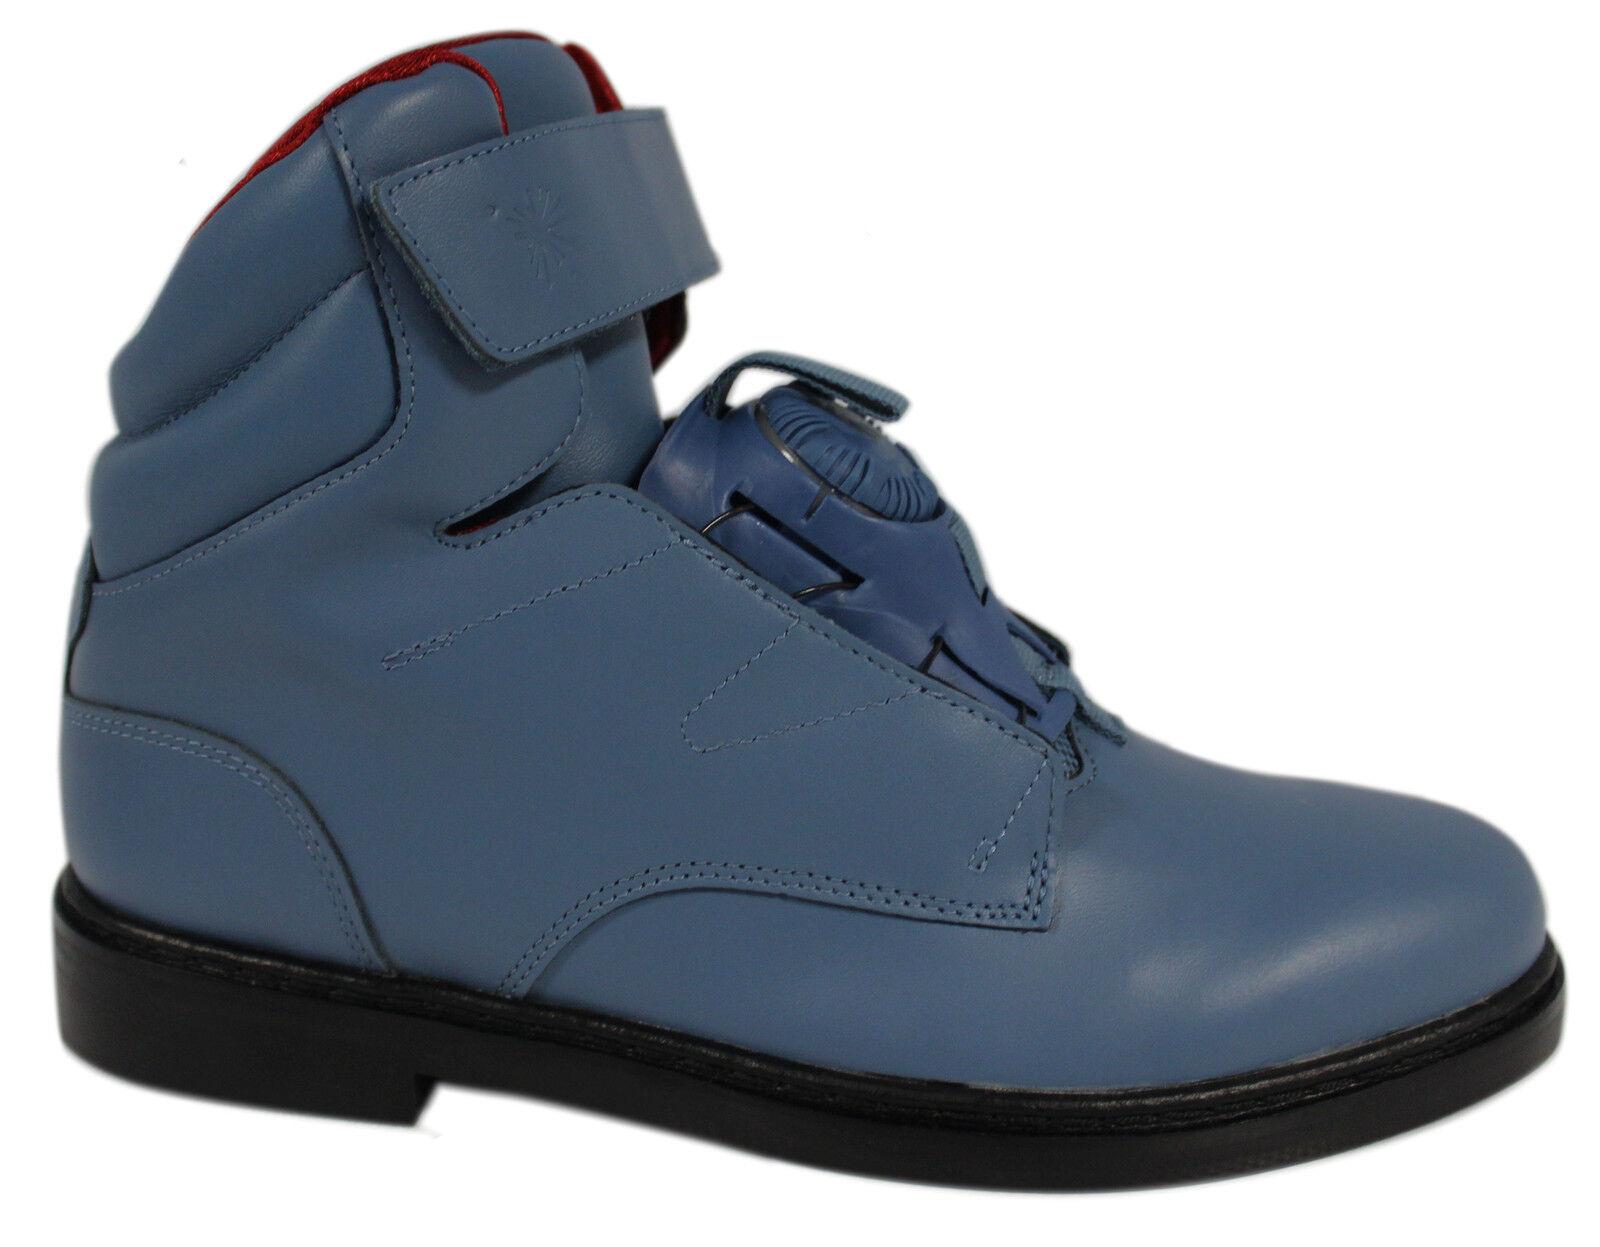 Puma Mihara Yasuhiro My-78     Herren Disc Brogue Stiefel Schuhes Blau 357081 02 M11 9c4d58